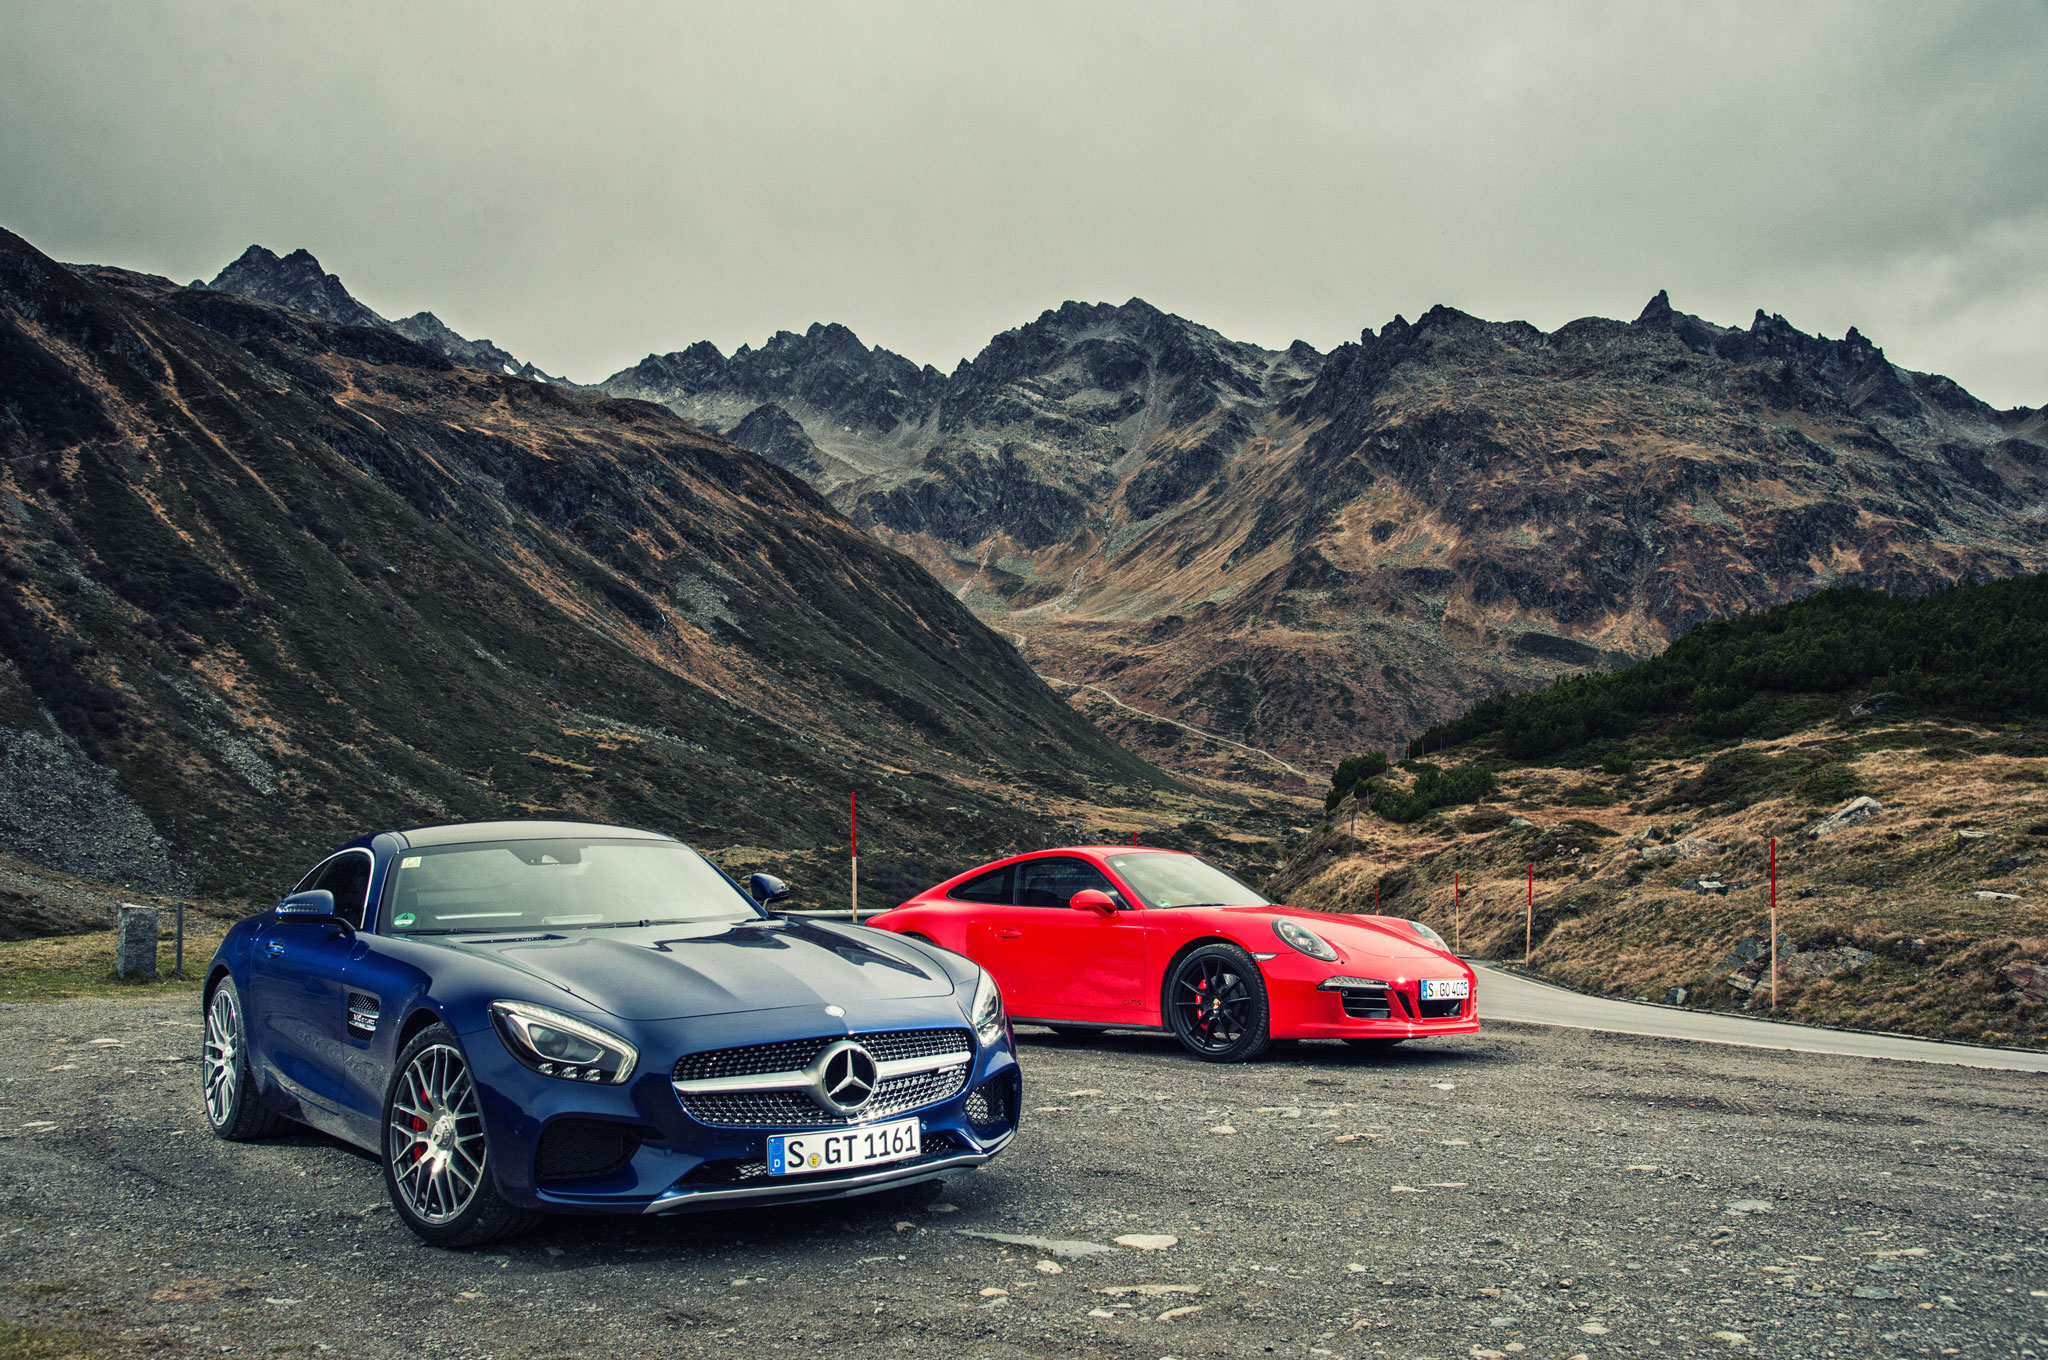 The New Rivalry 2016 Mercedes Amg Gt S Vs 2015 Porsche 911 Gts